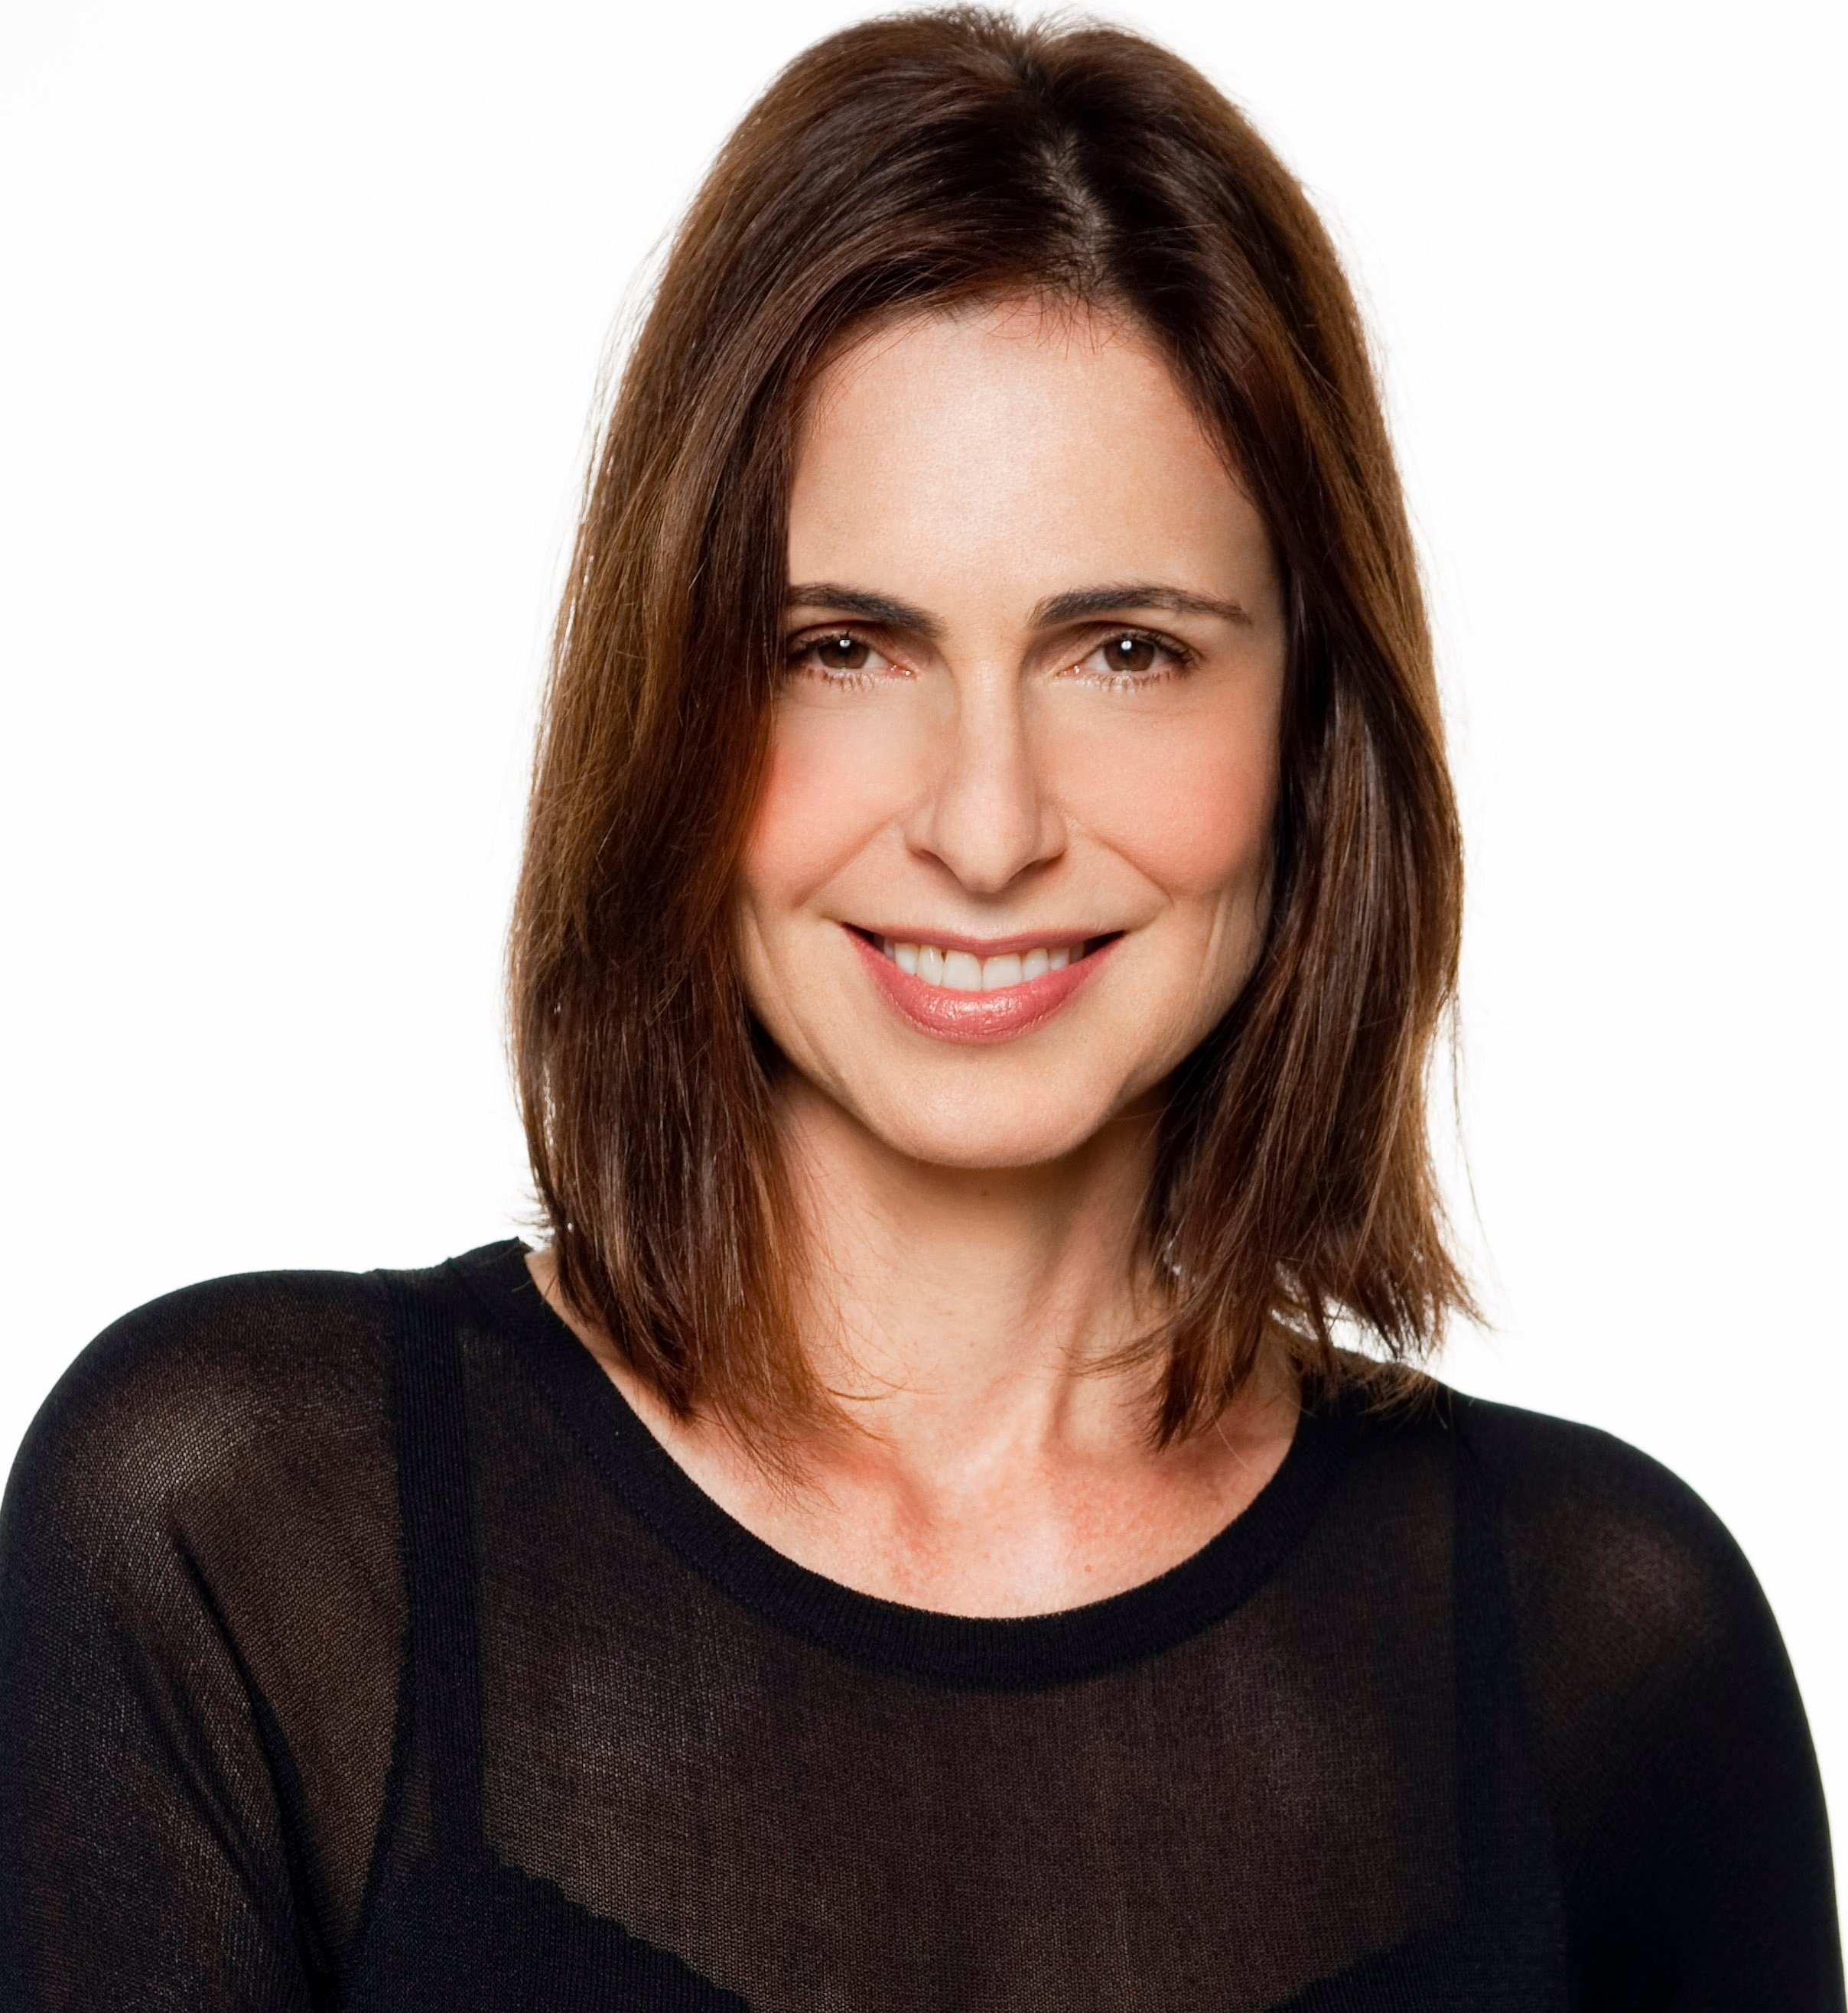 Silvia Pfeifer - site. 1 JPG